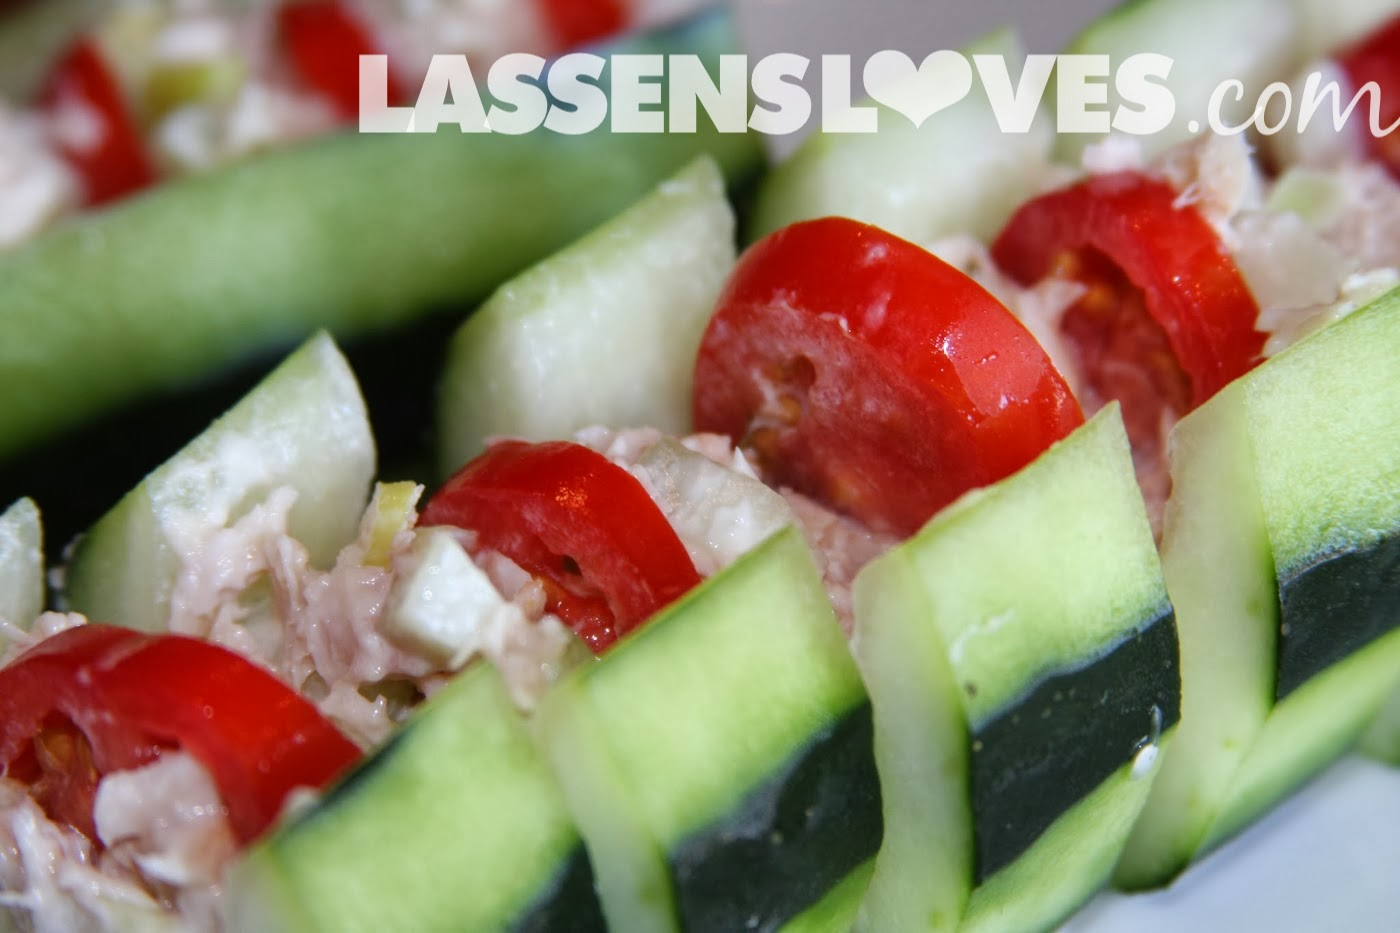 lassensloves.com, Lassen's, Lassens, cucumber+tuna